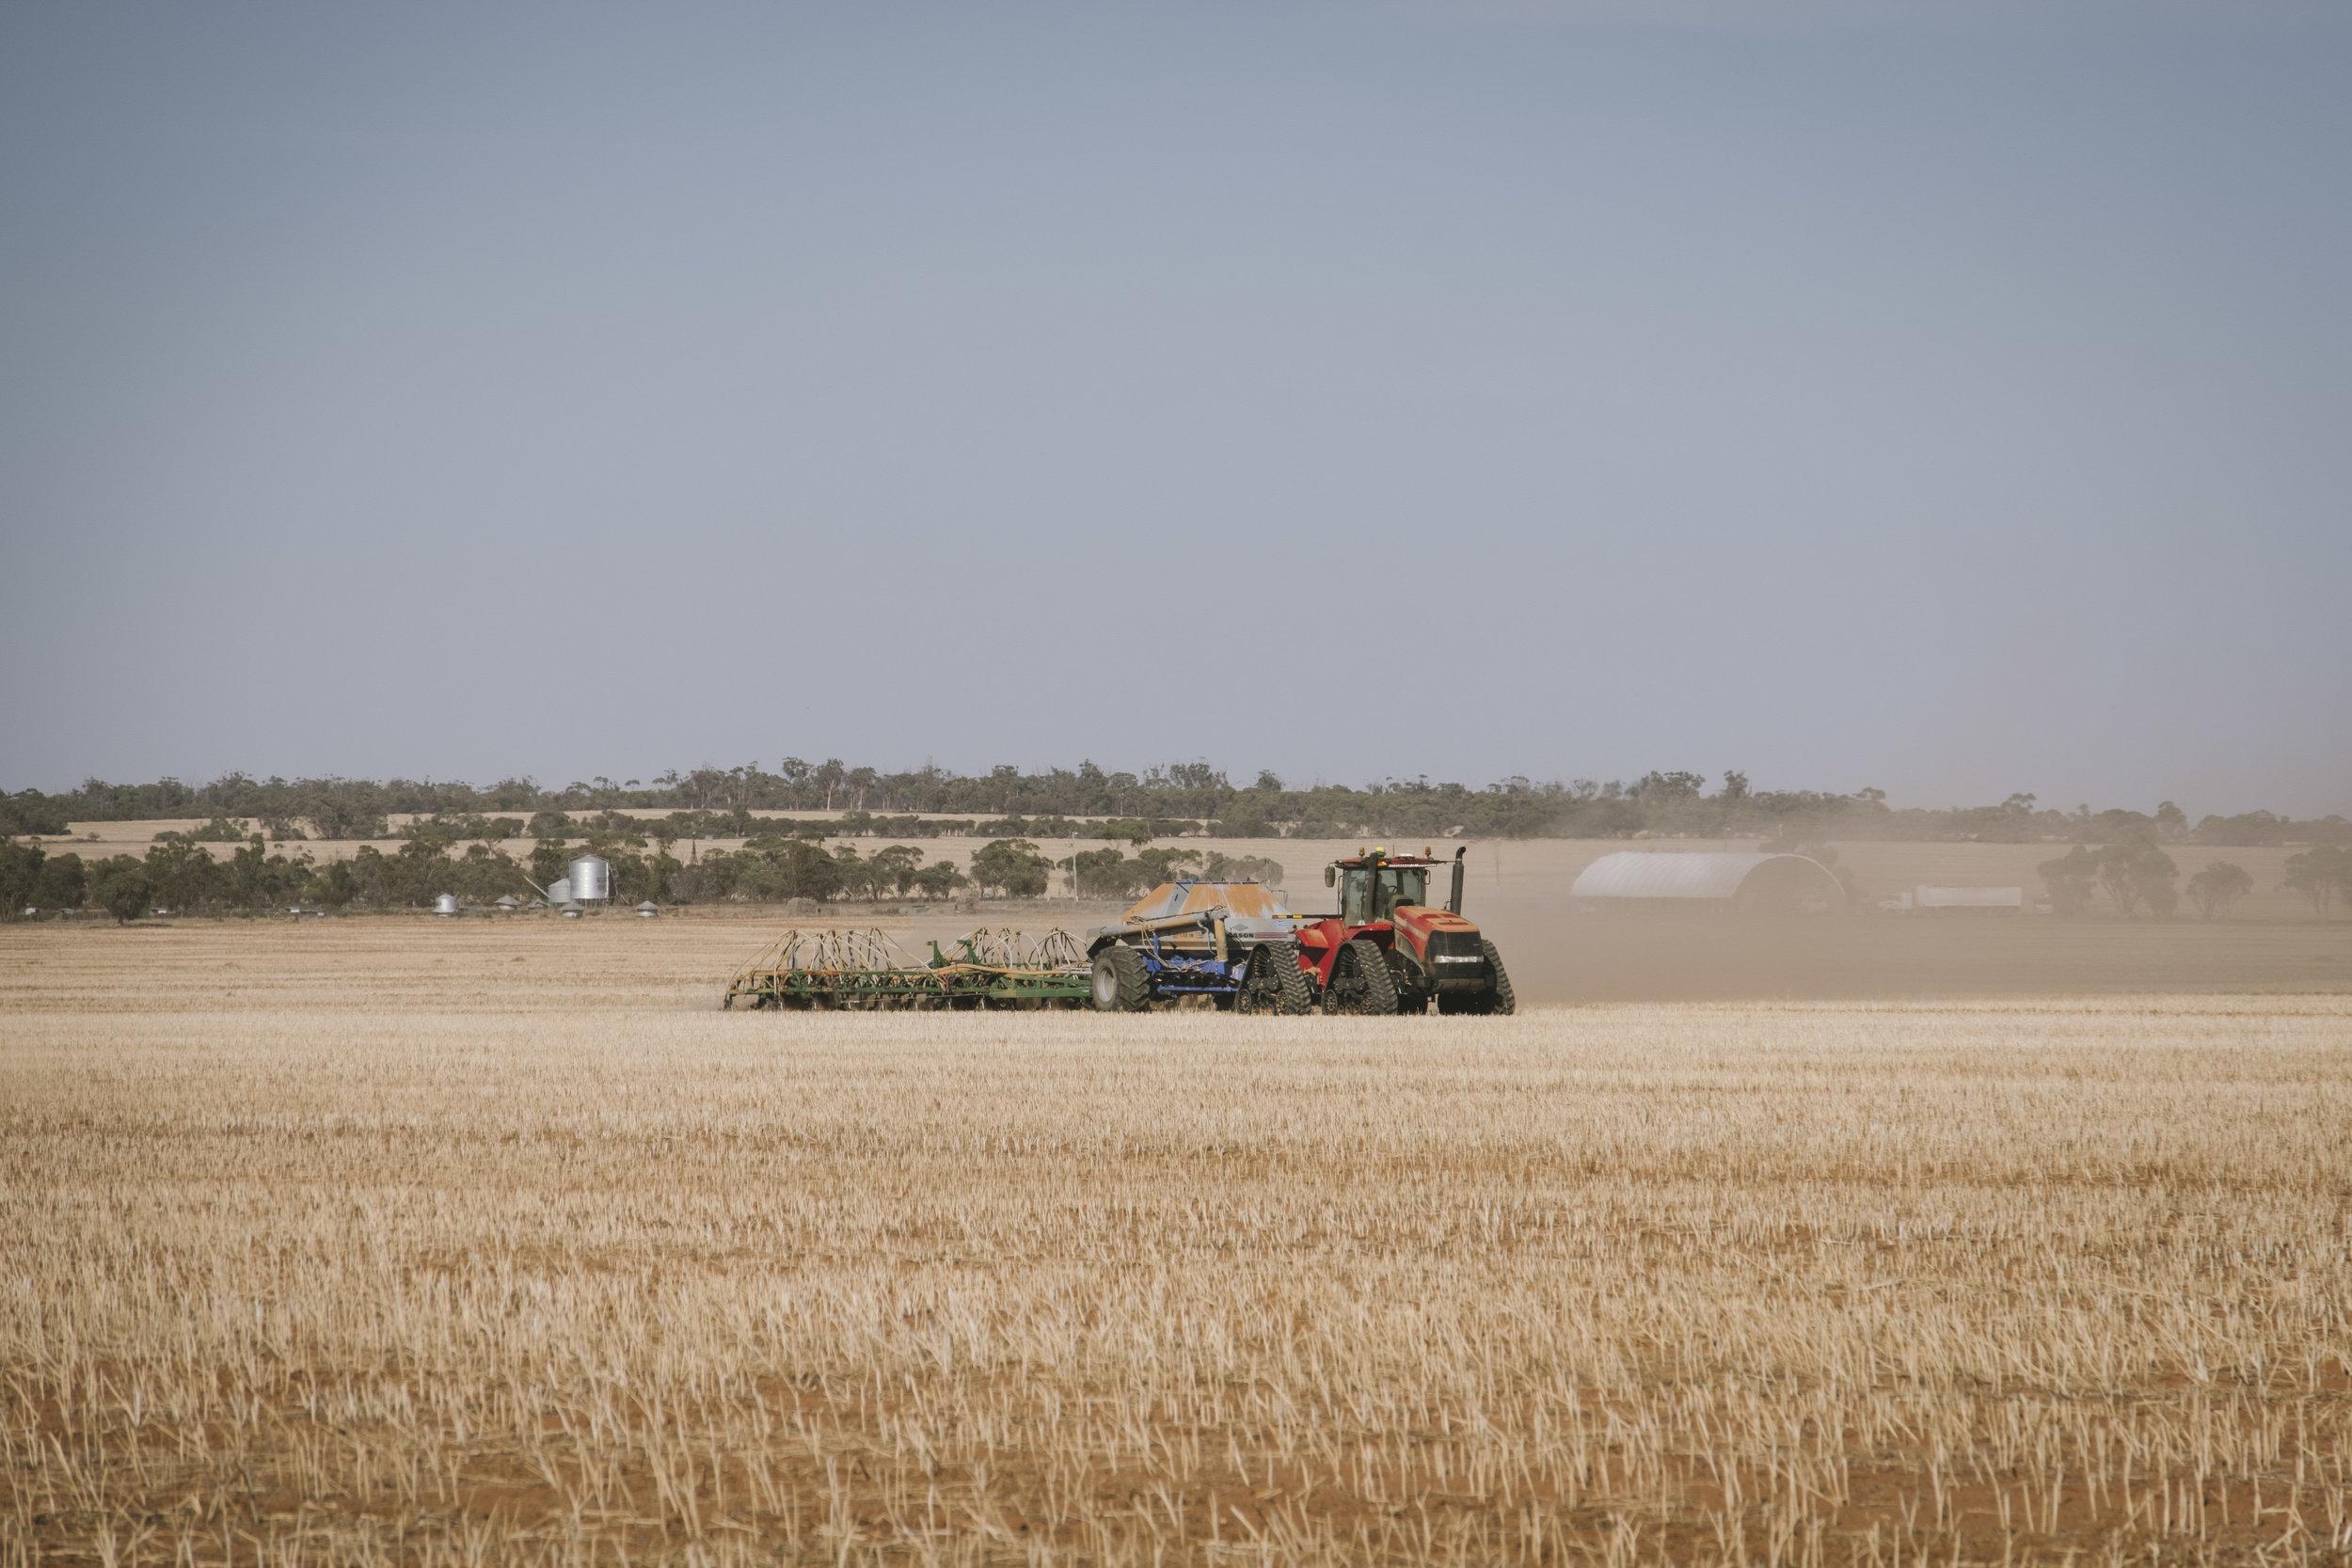 Angie Roe Photography Wheatbelt Rural Farm Landscape Seeding (1).jpg